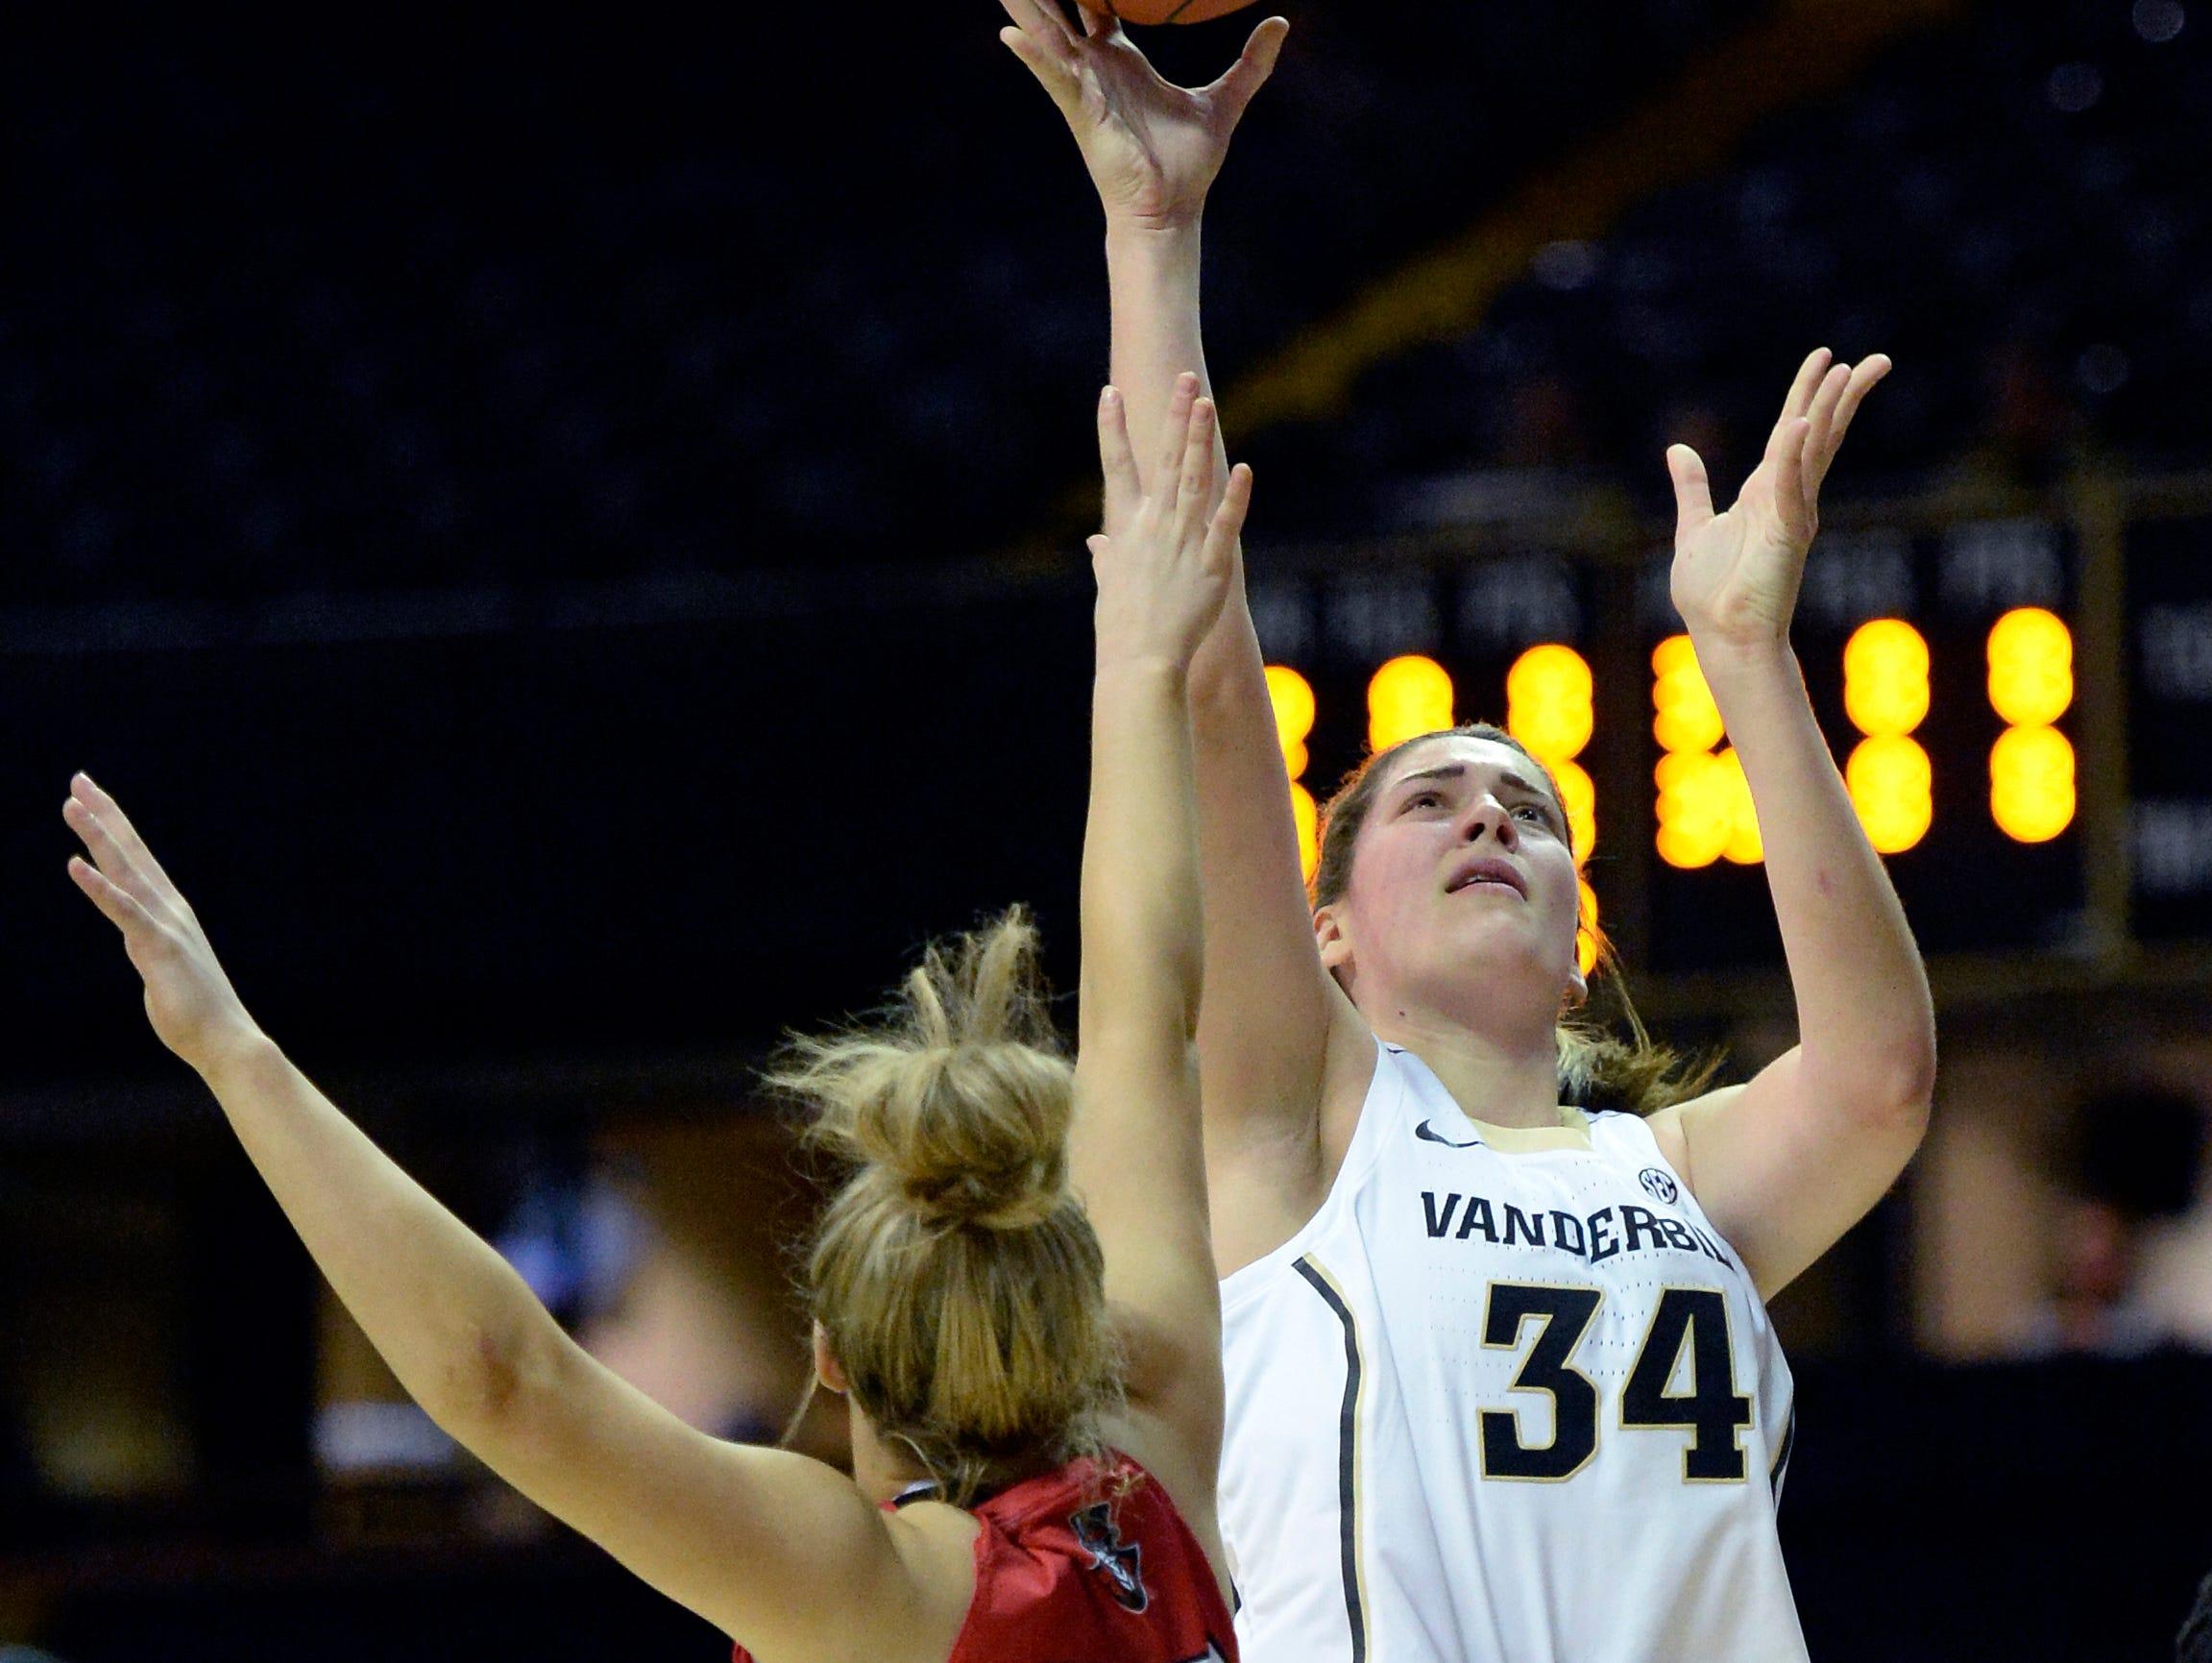 Vanderbilt women's basketball: Mariella Fasoula's 25 points earns win over Austin Peay